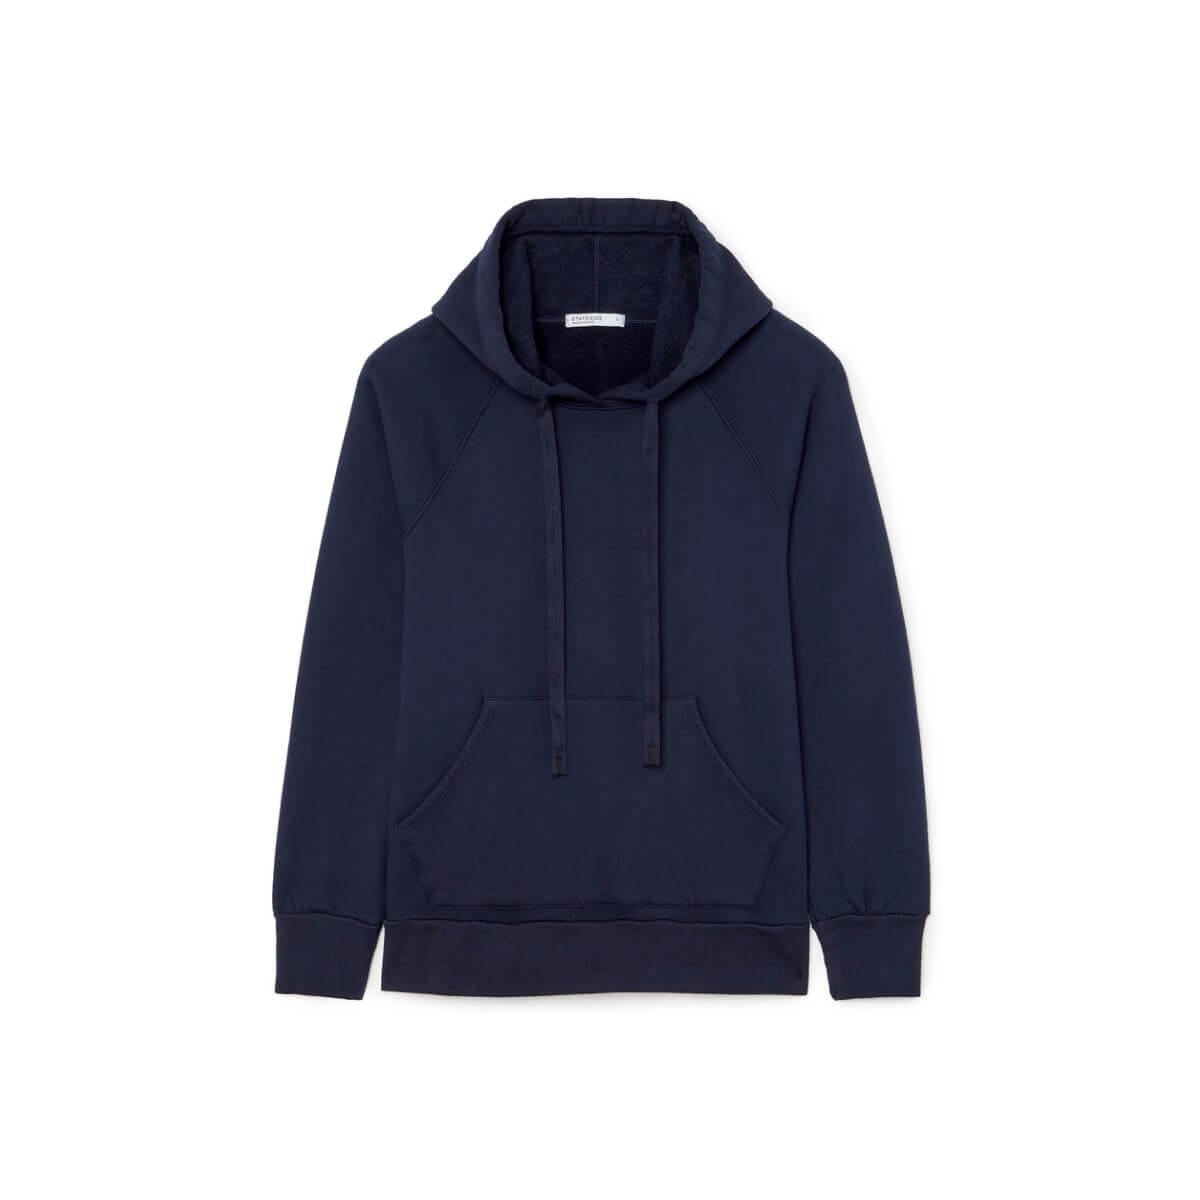 Stateside hoodie